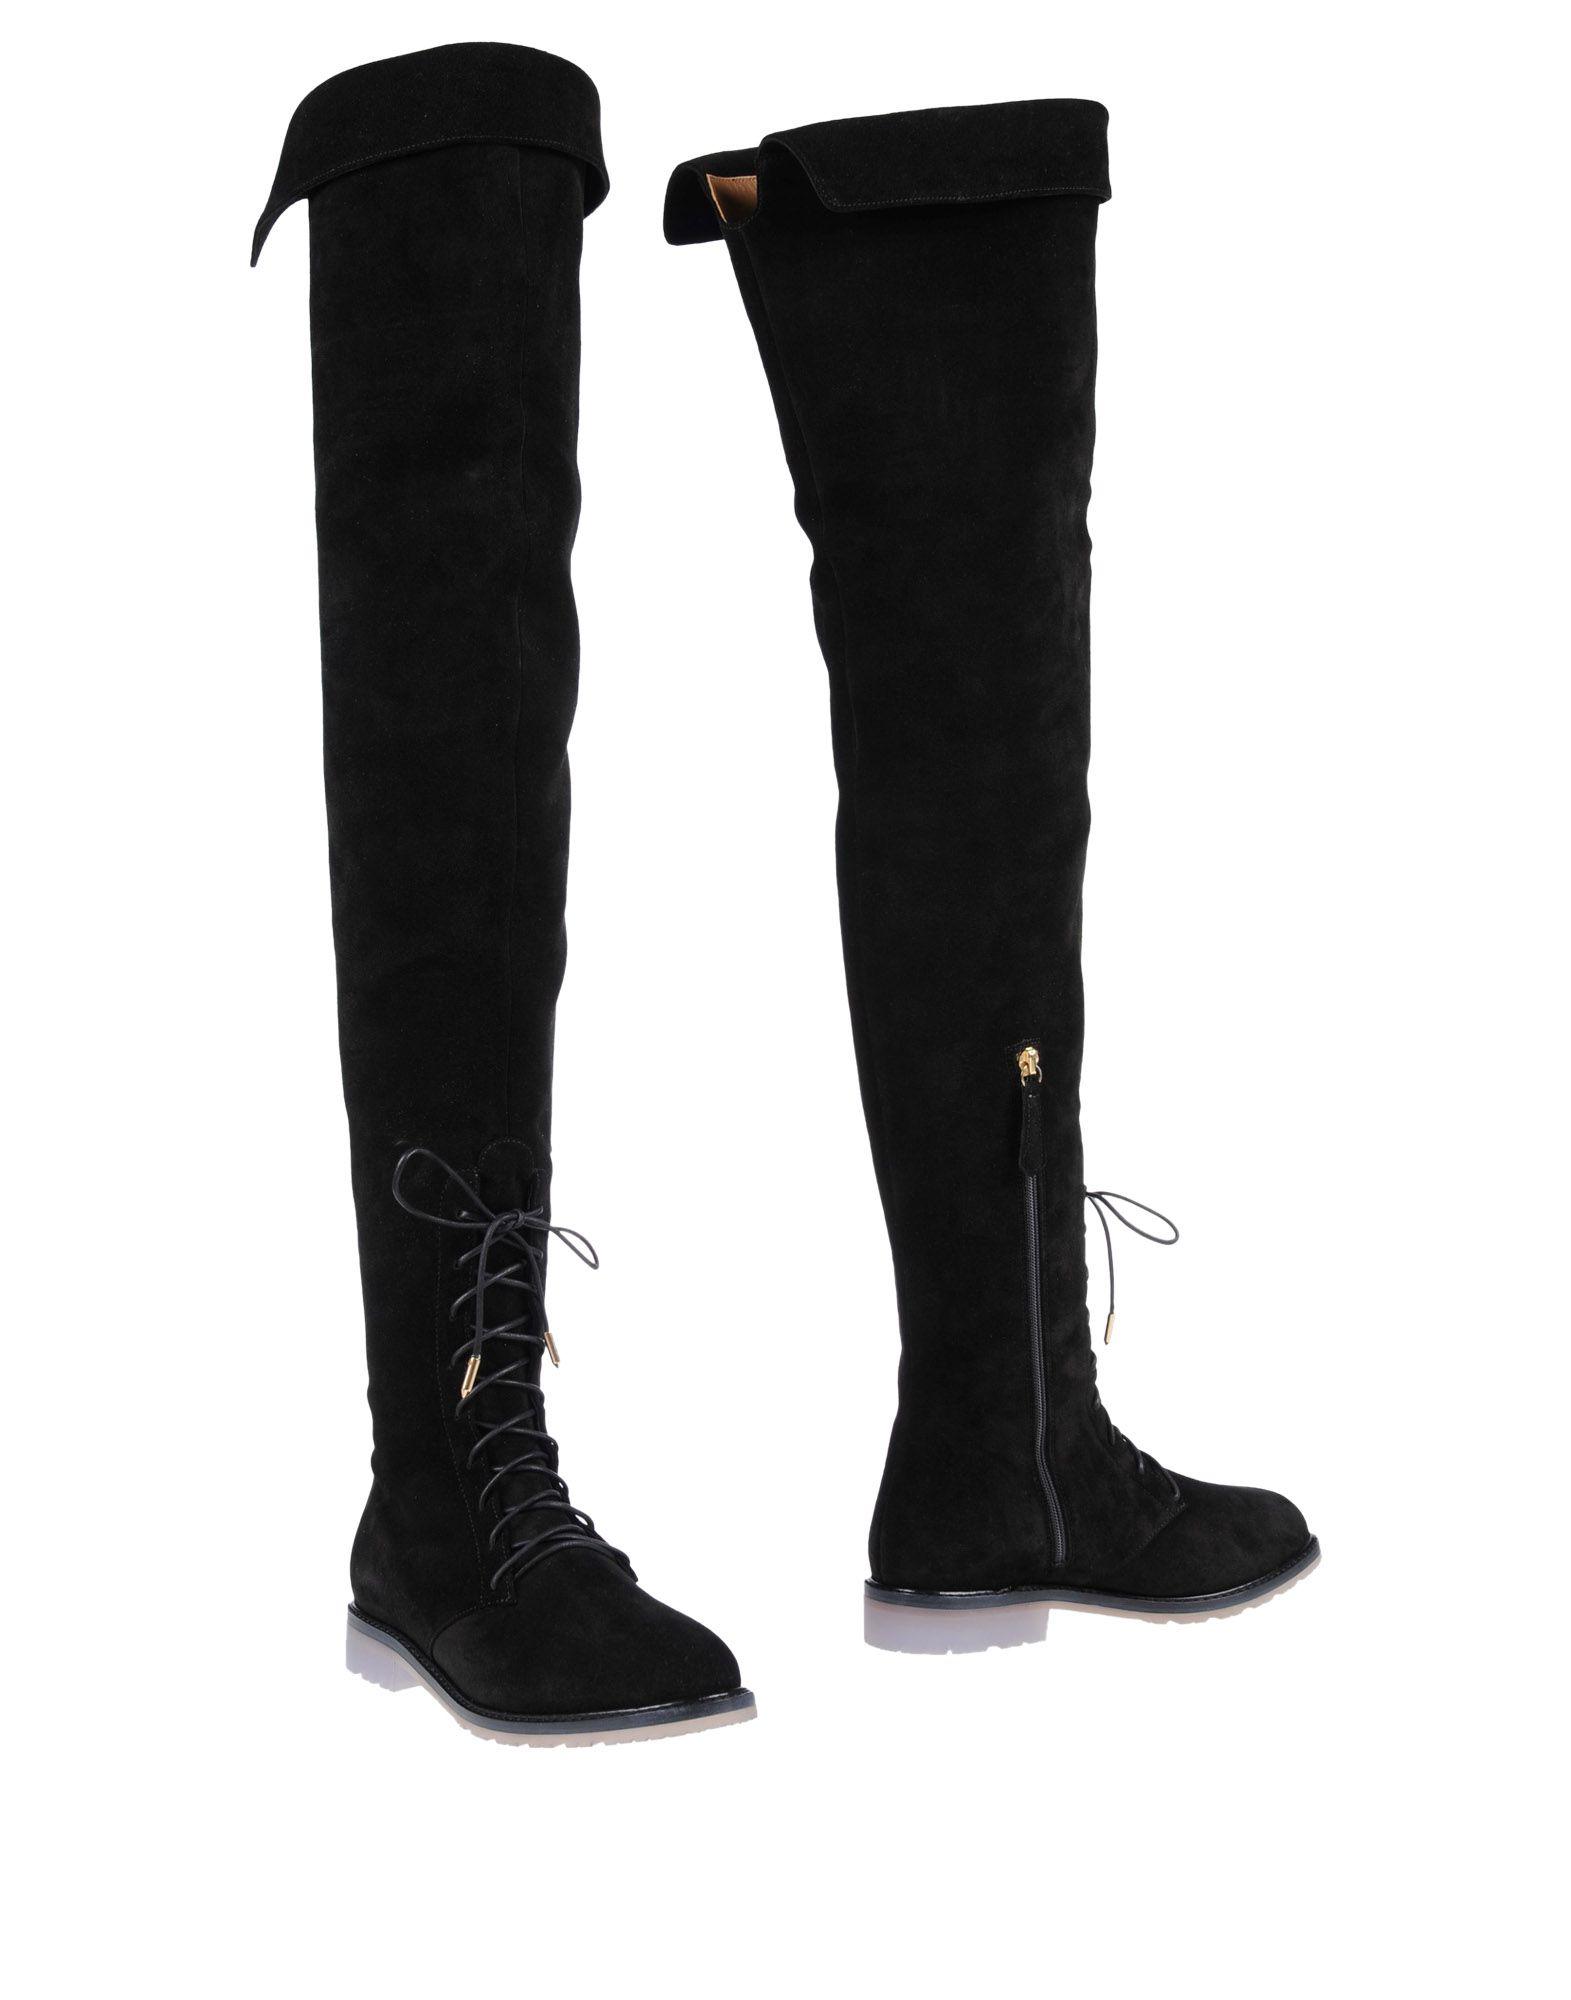 Aquazzura Boots - on Women Aquazzura Boots online on -  United Kingdom - 11453316NB 56d638